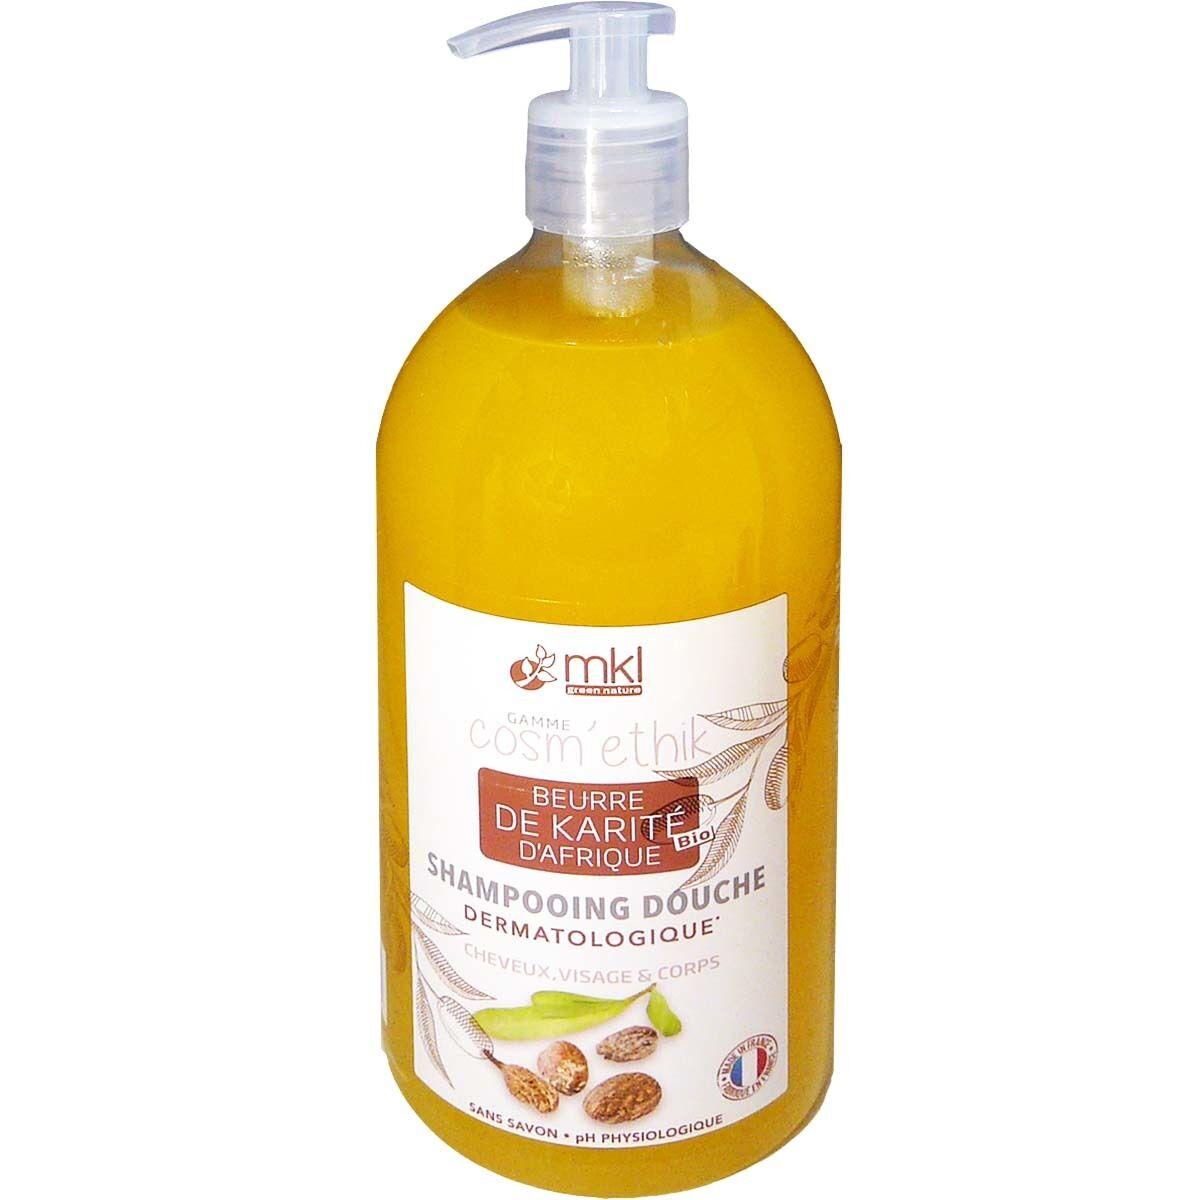 Mkl shampooing-douche beurre de karite bio 1l